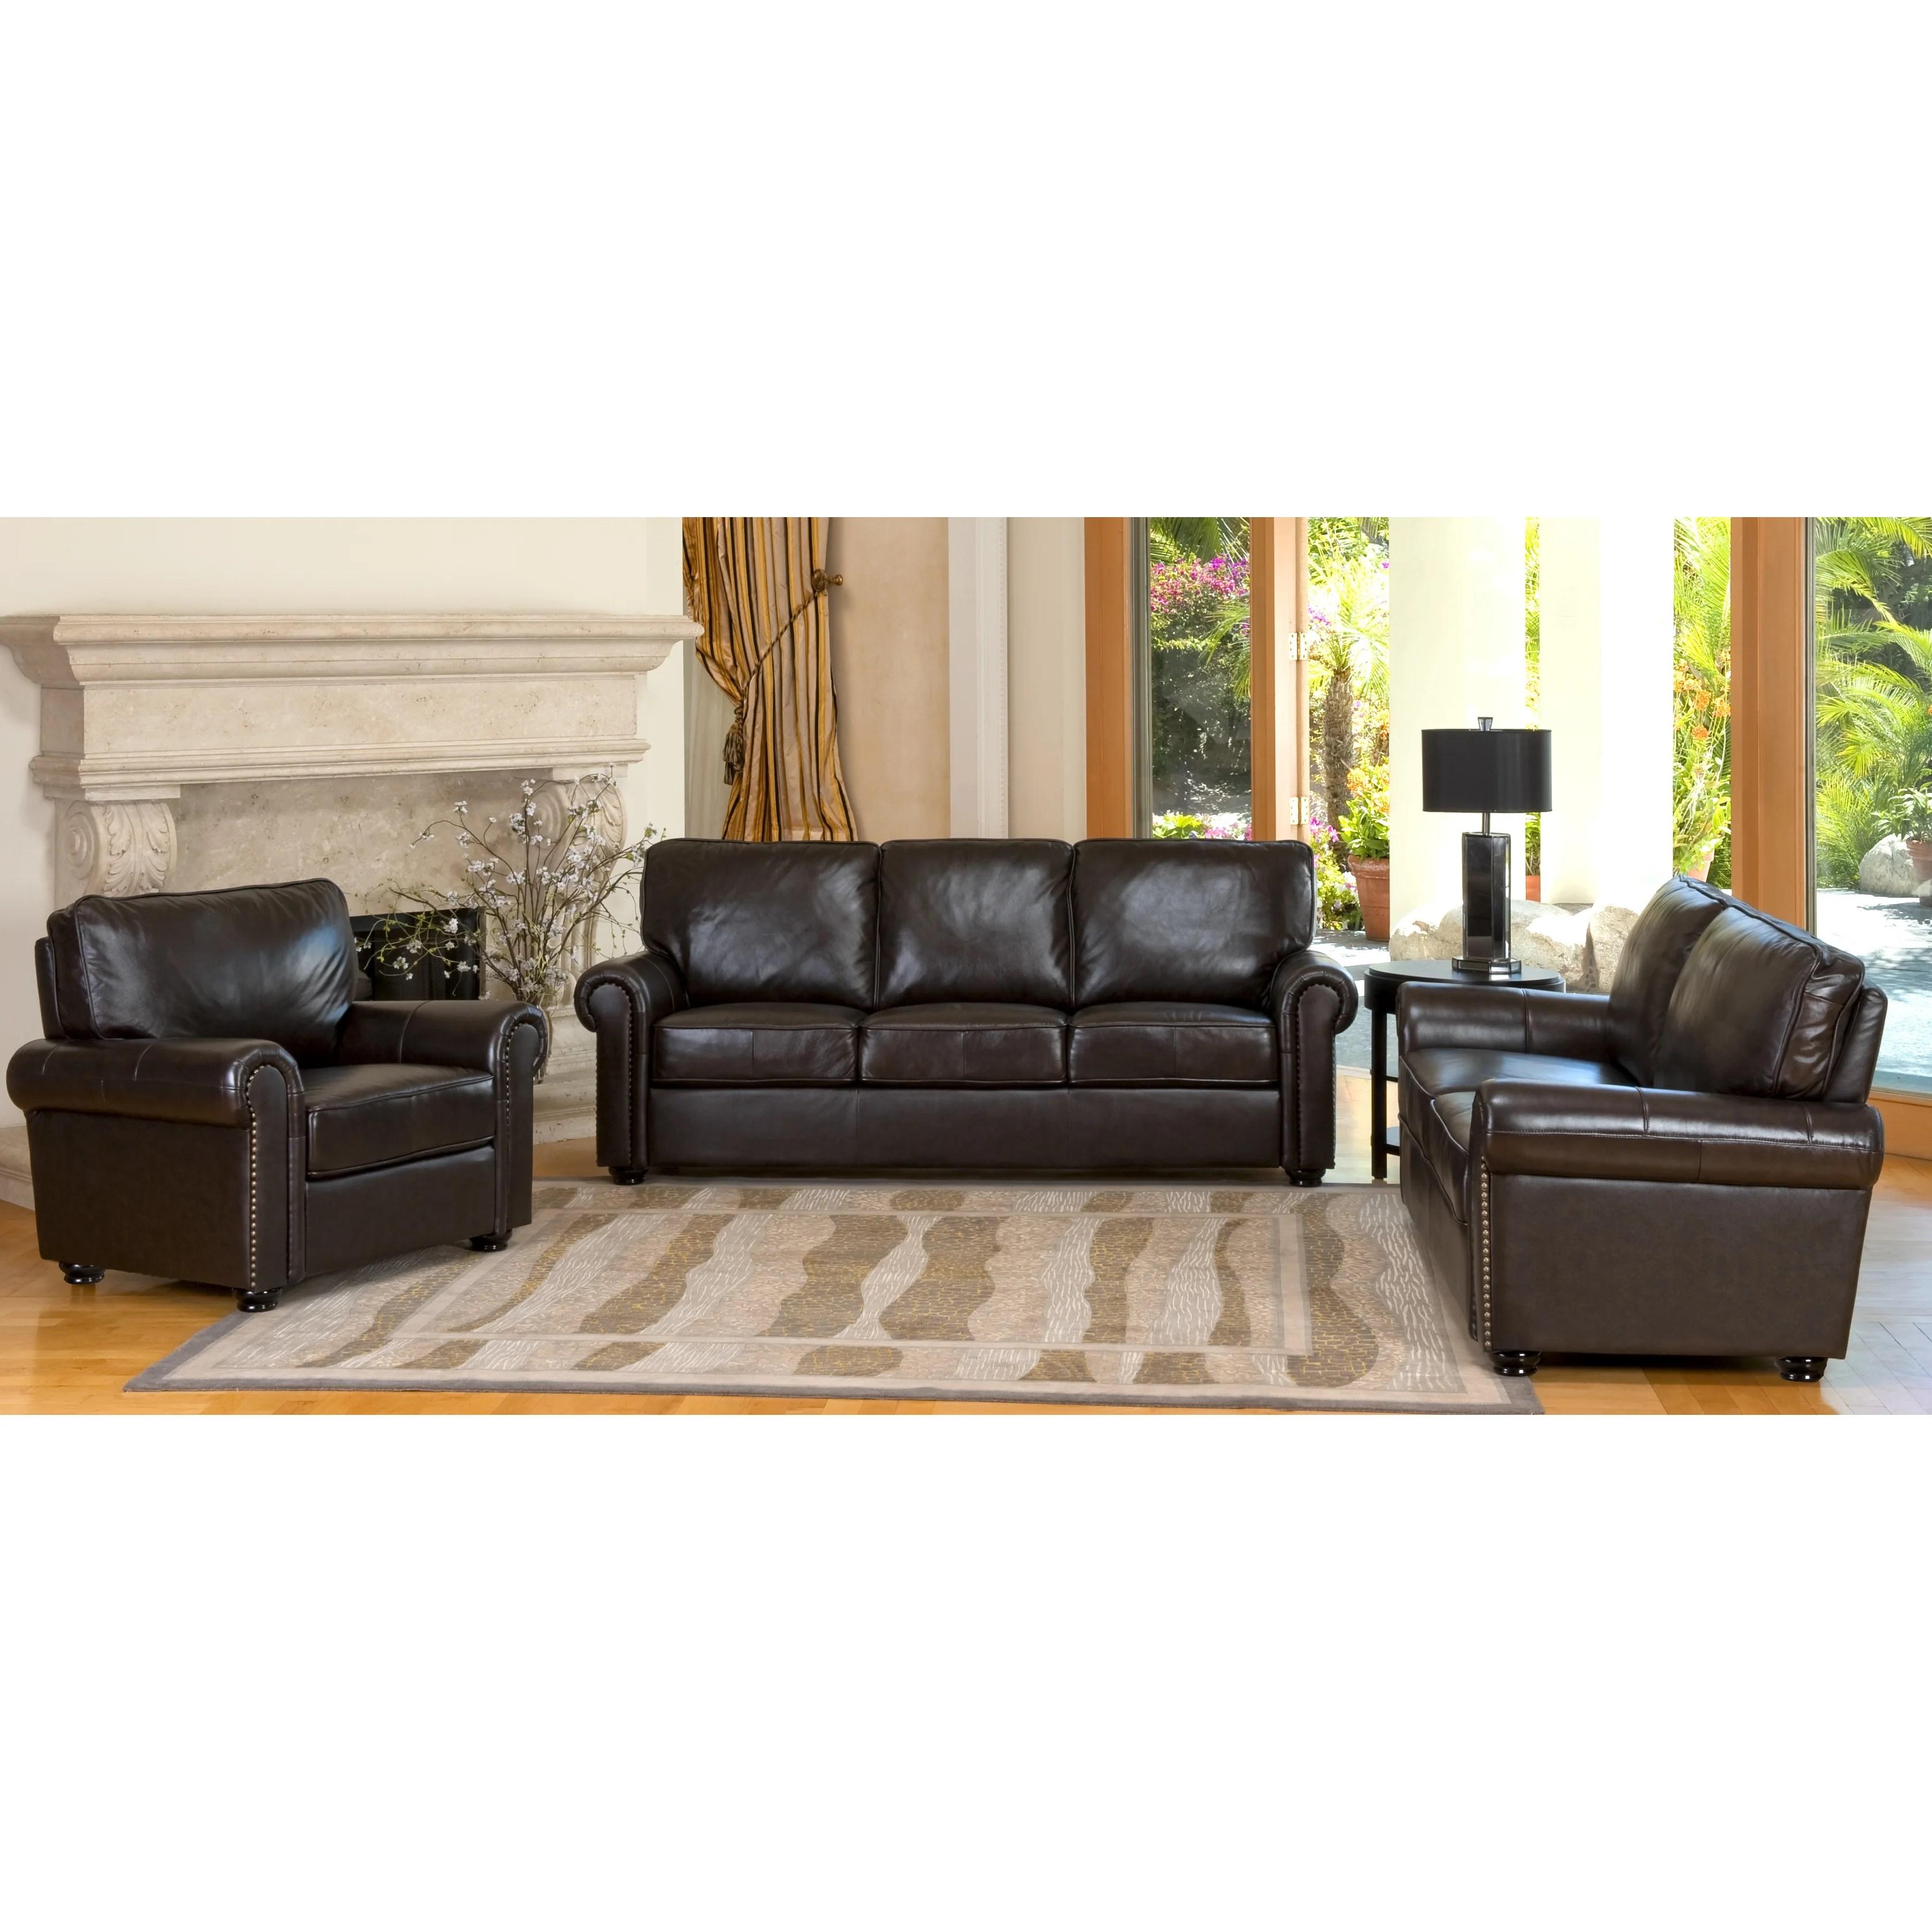 italian leather sofa reviews paramount scandinavian designs darby home co coggins 3 piece